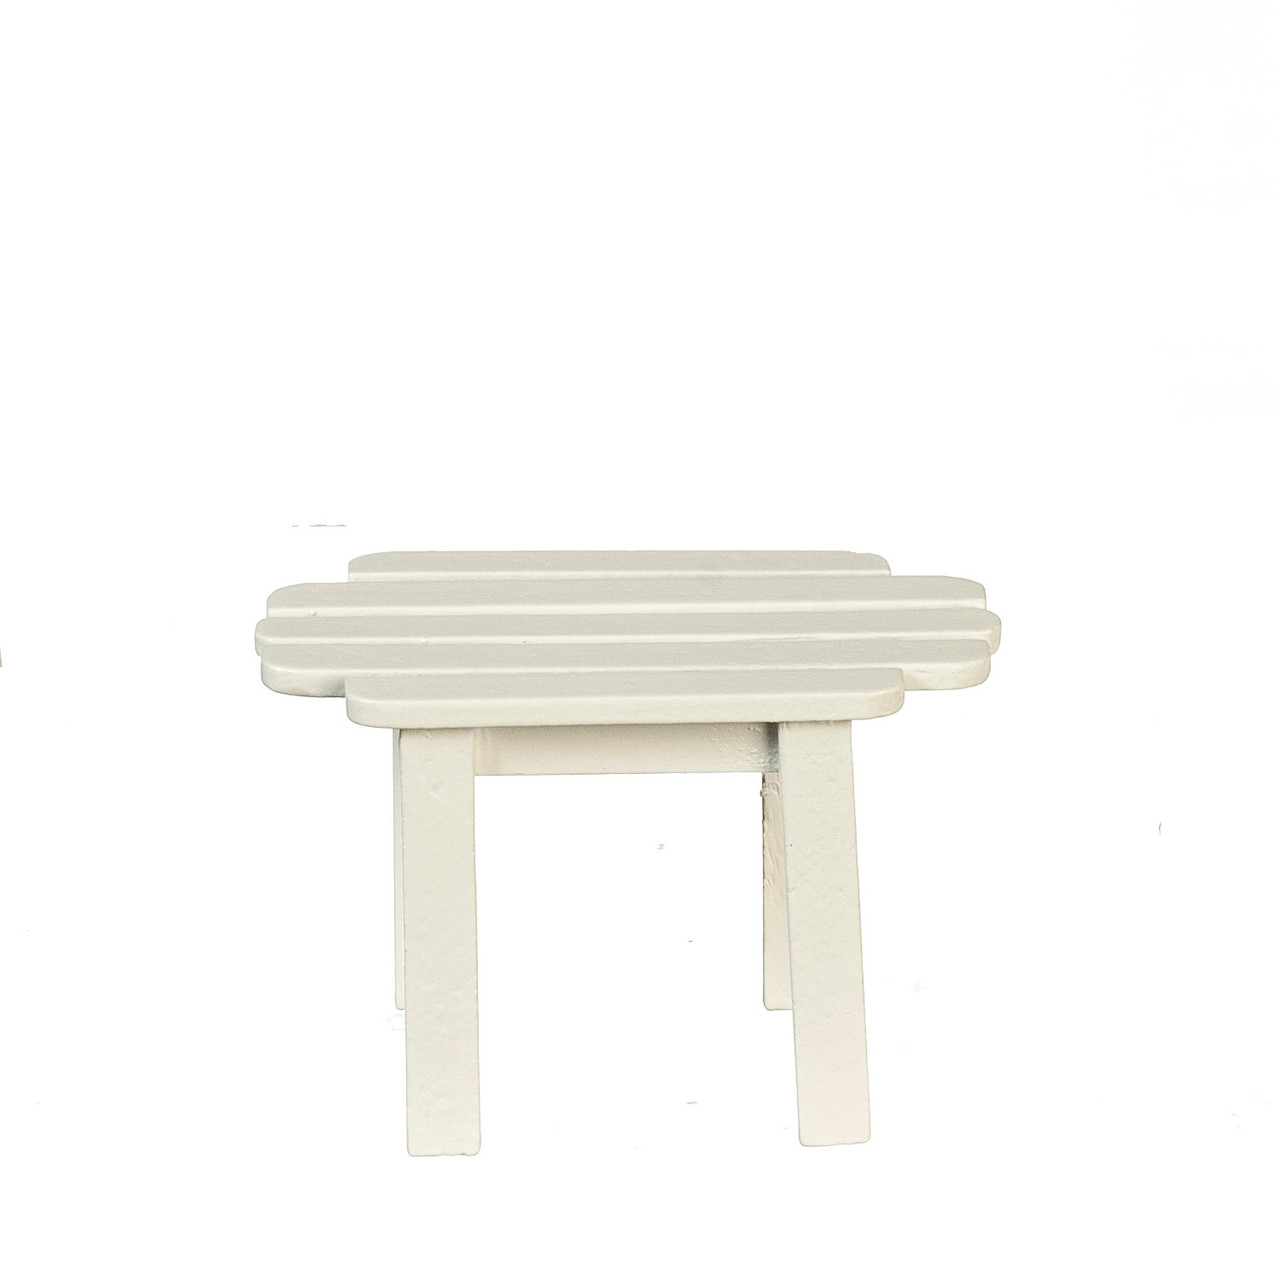 Adirondack Table - White